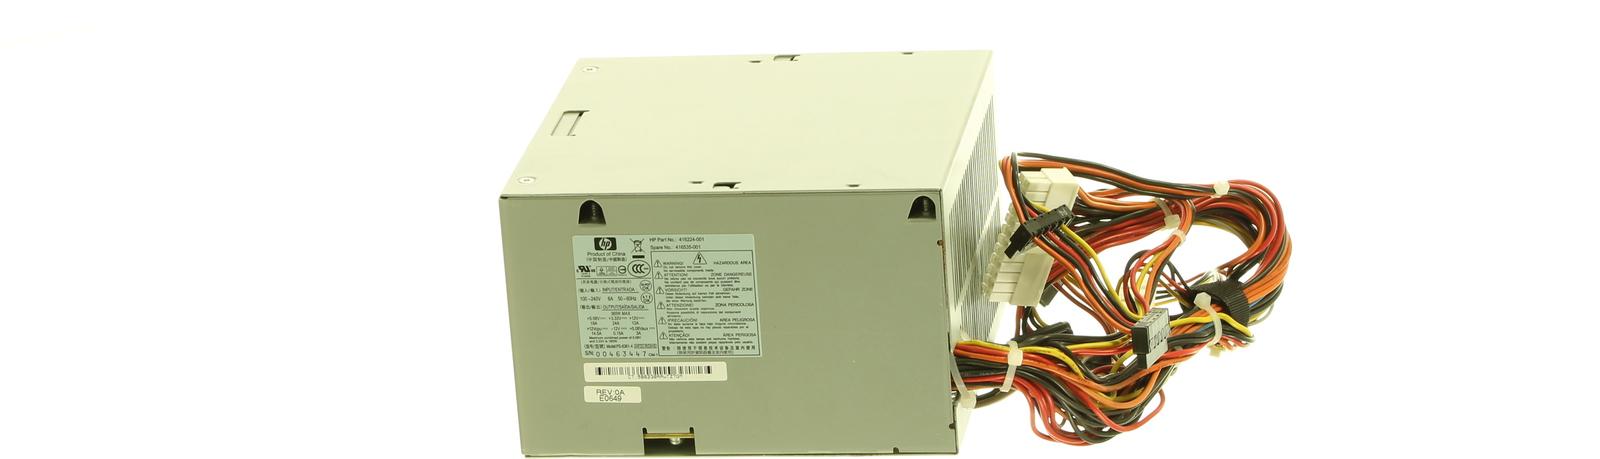 Power Supply 365W**Refurbished**